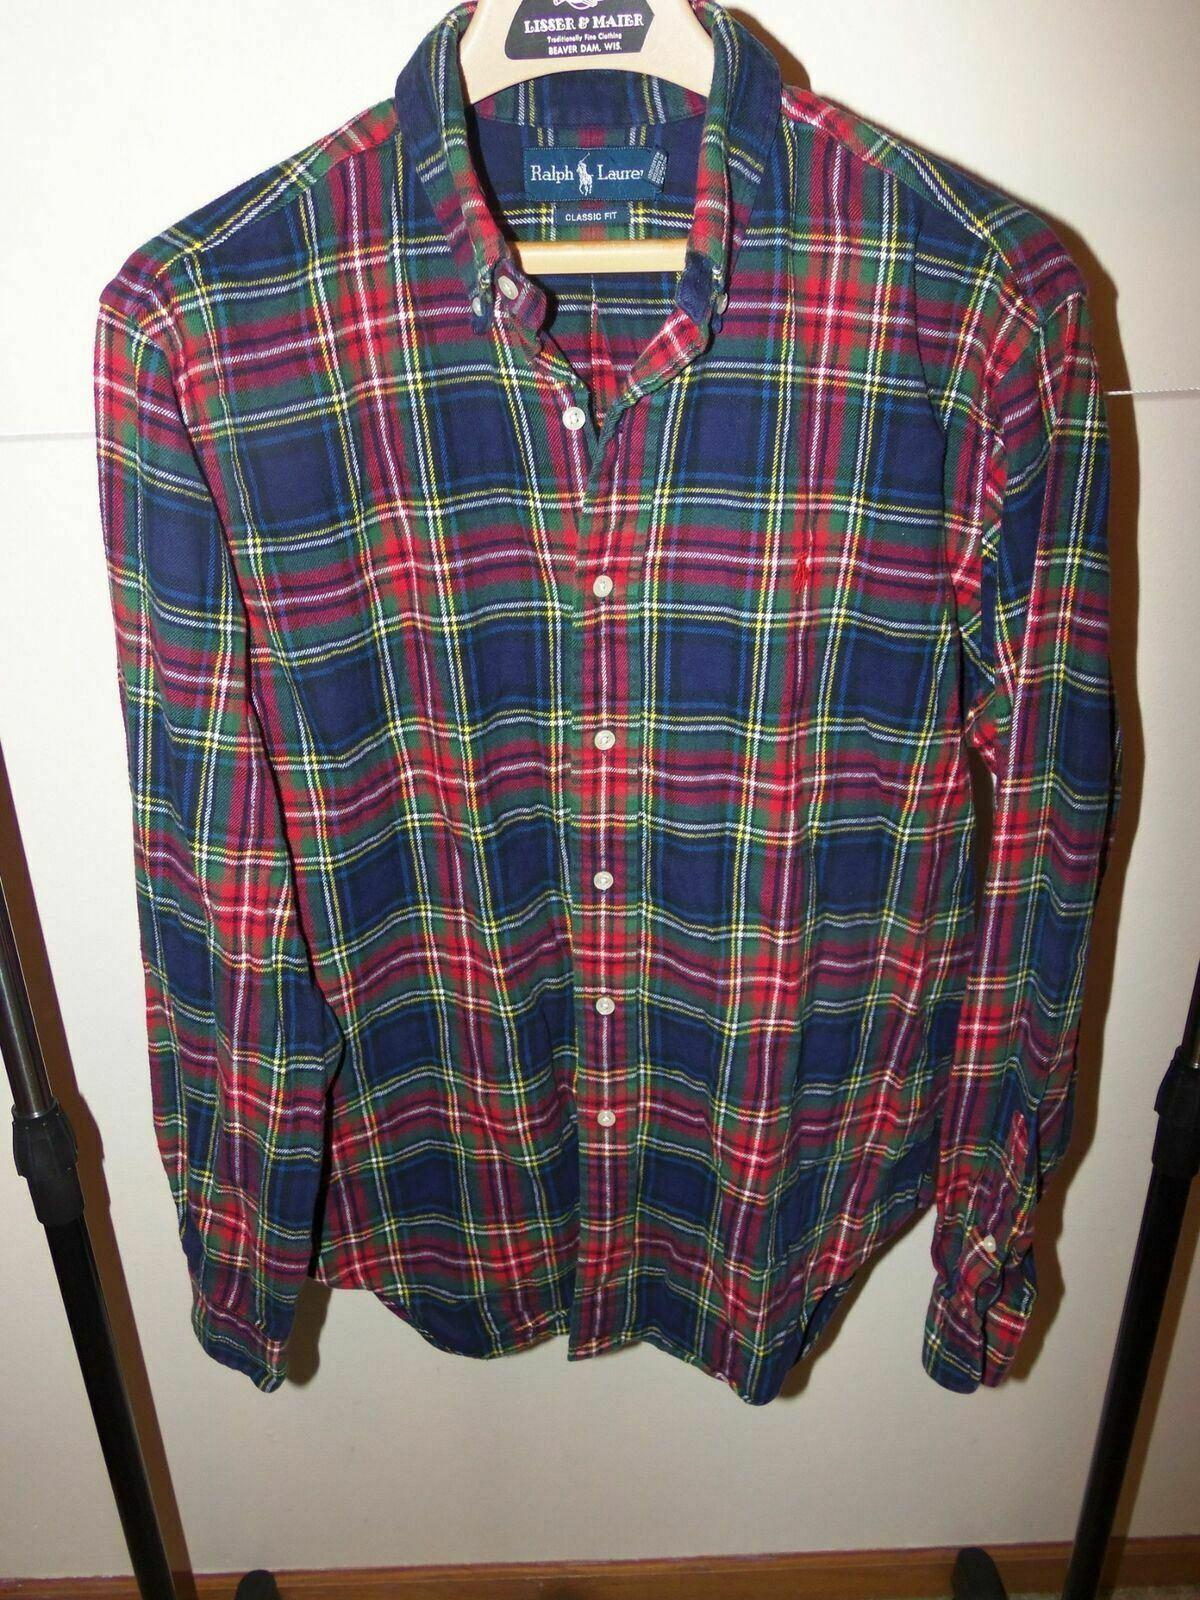 14-16 NWT Ralph Lauren Boys Cotton Plaid Long Sleeve Shirt Red Multi Sz L